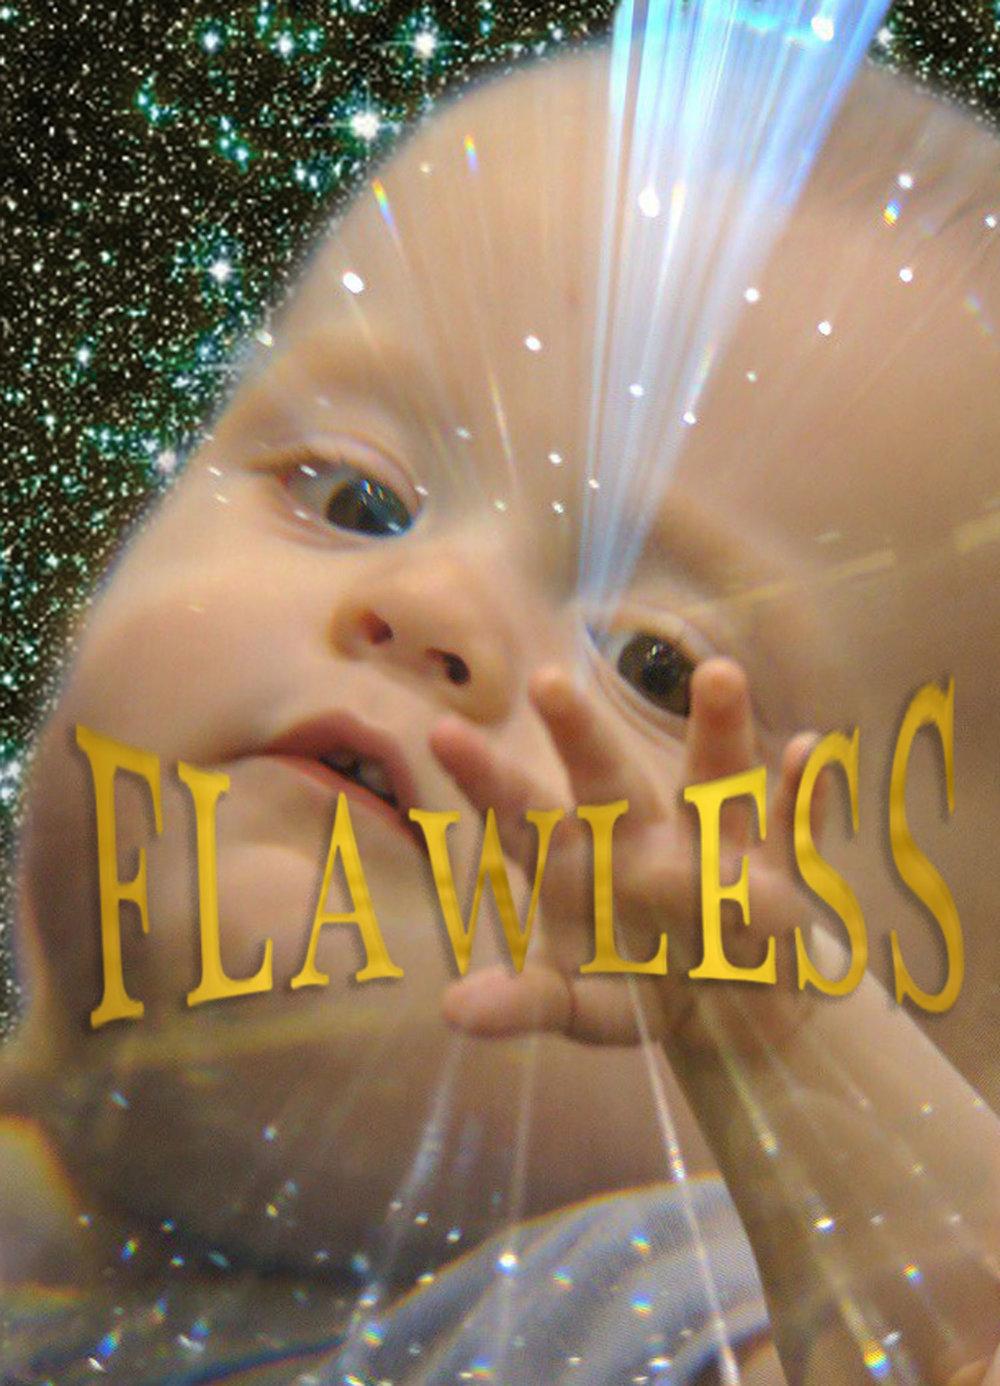 Flawless - single